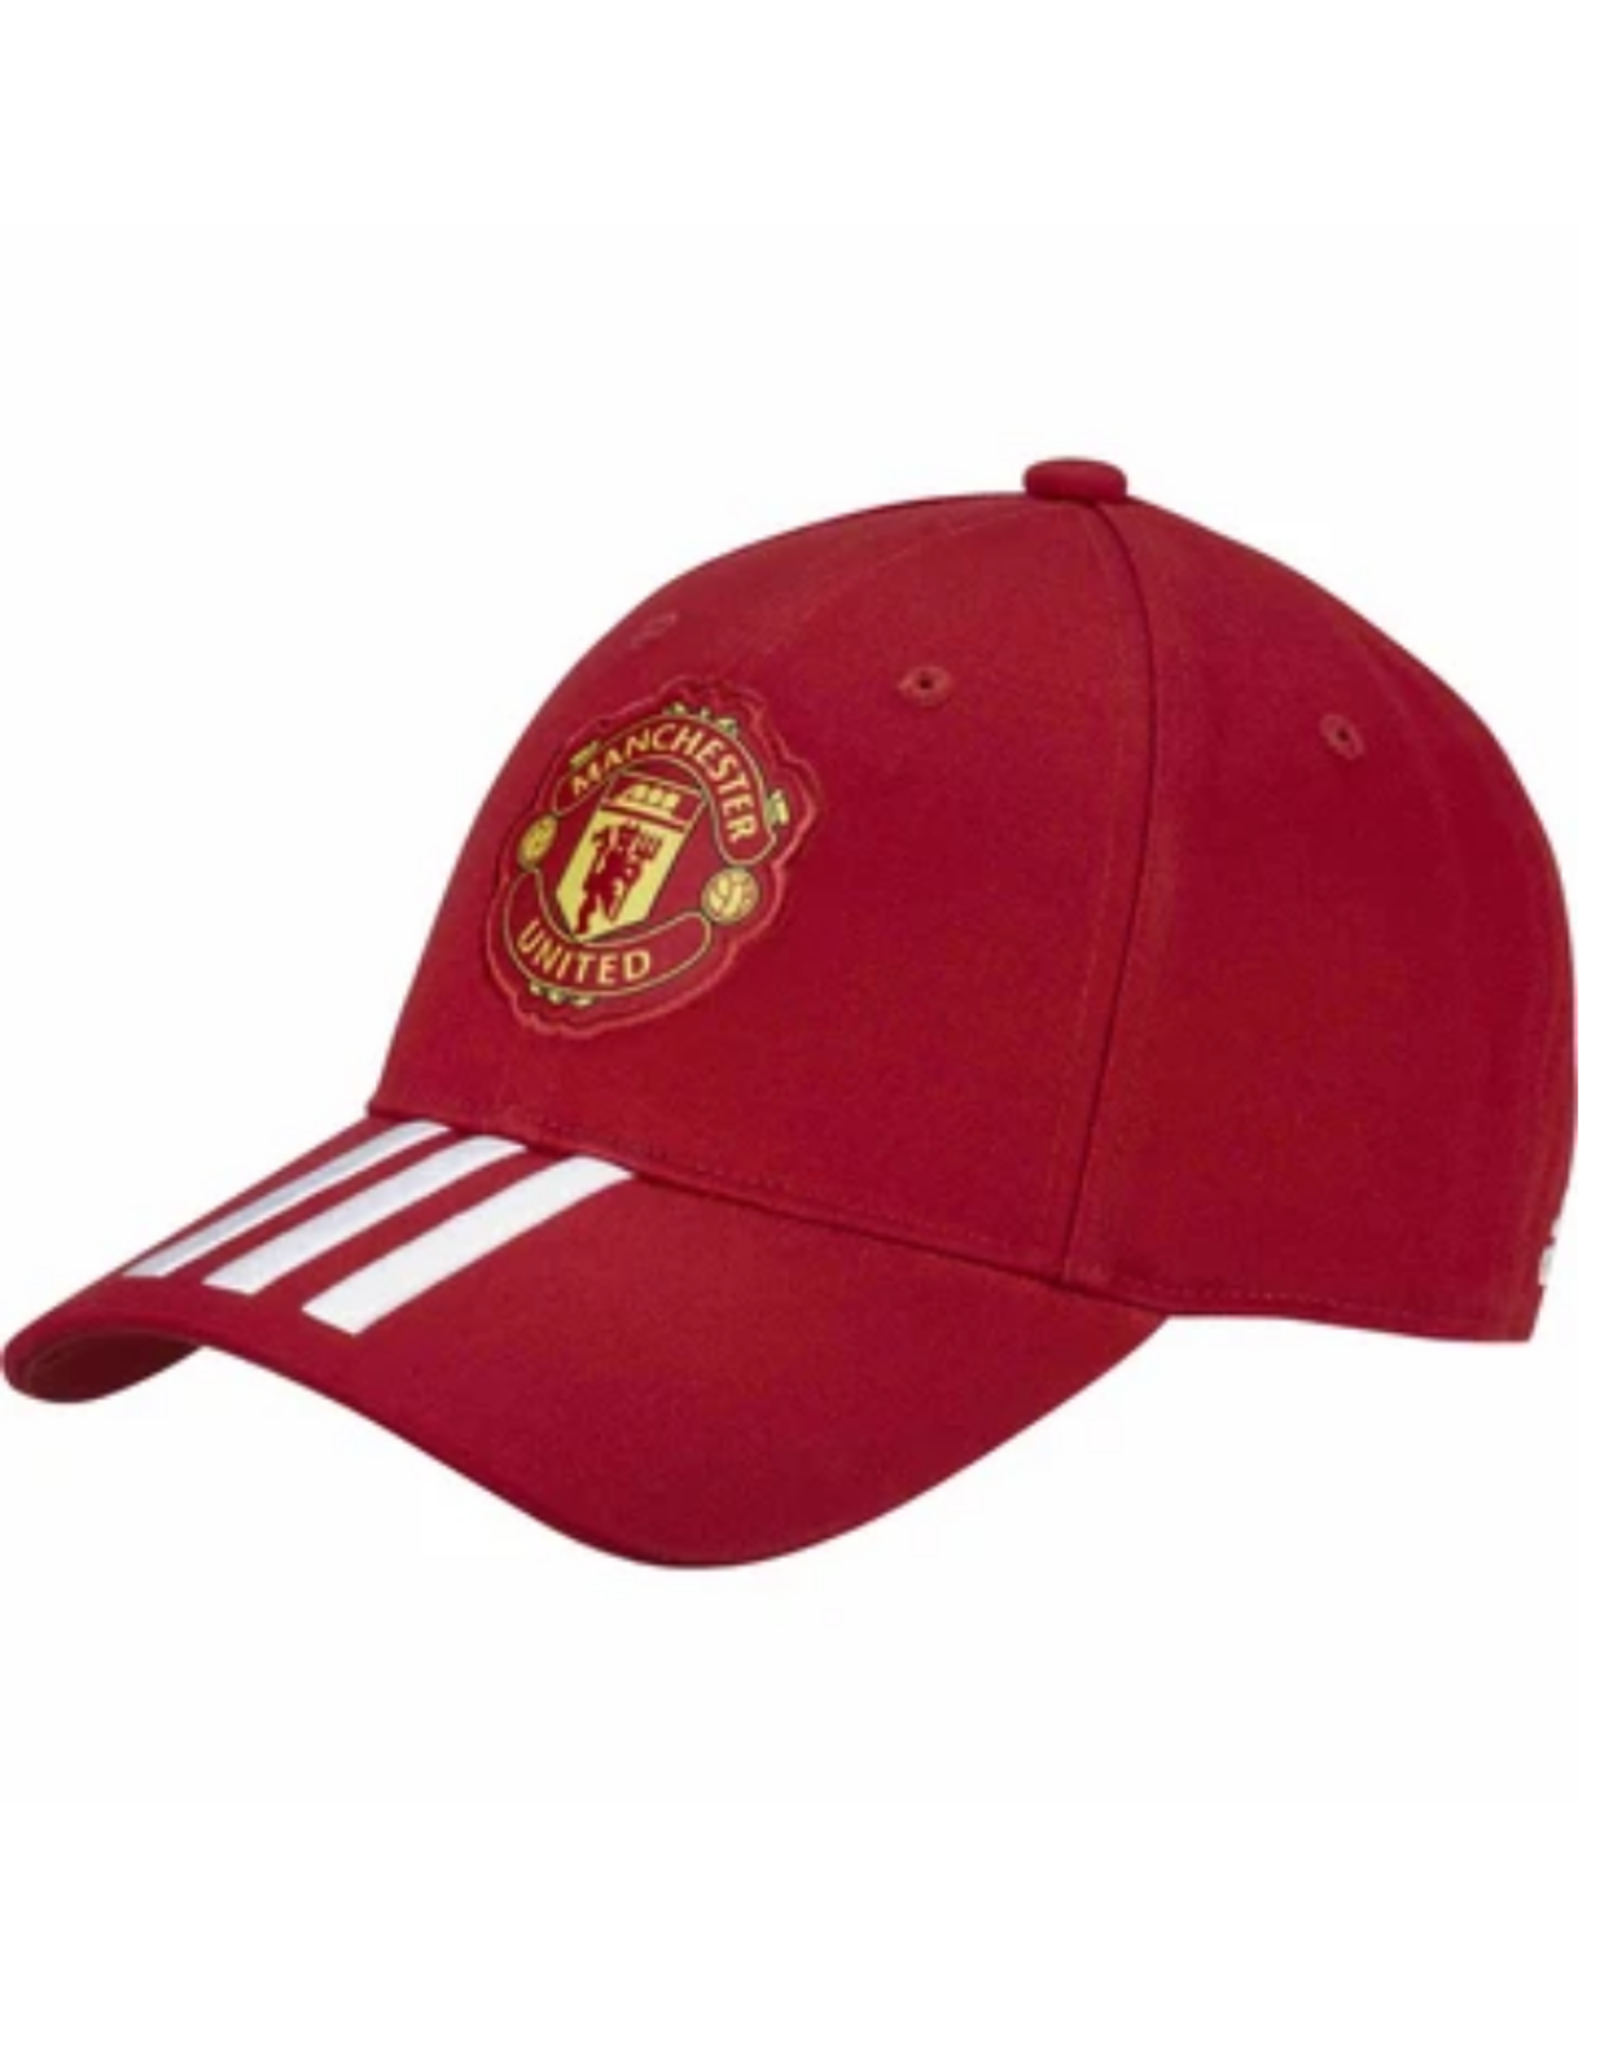 Adidas Adidas Men's Manchester United Adjustable Hat Red